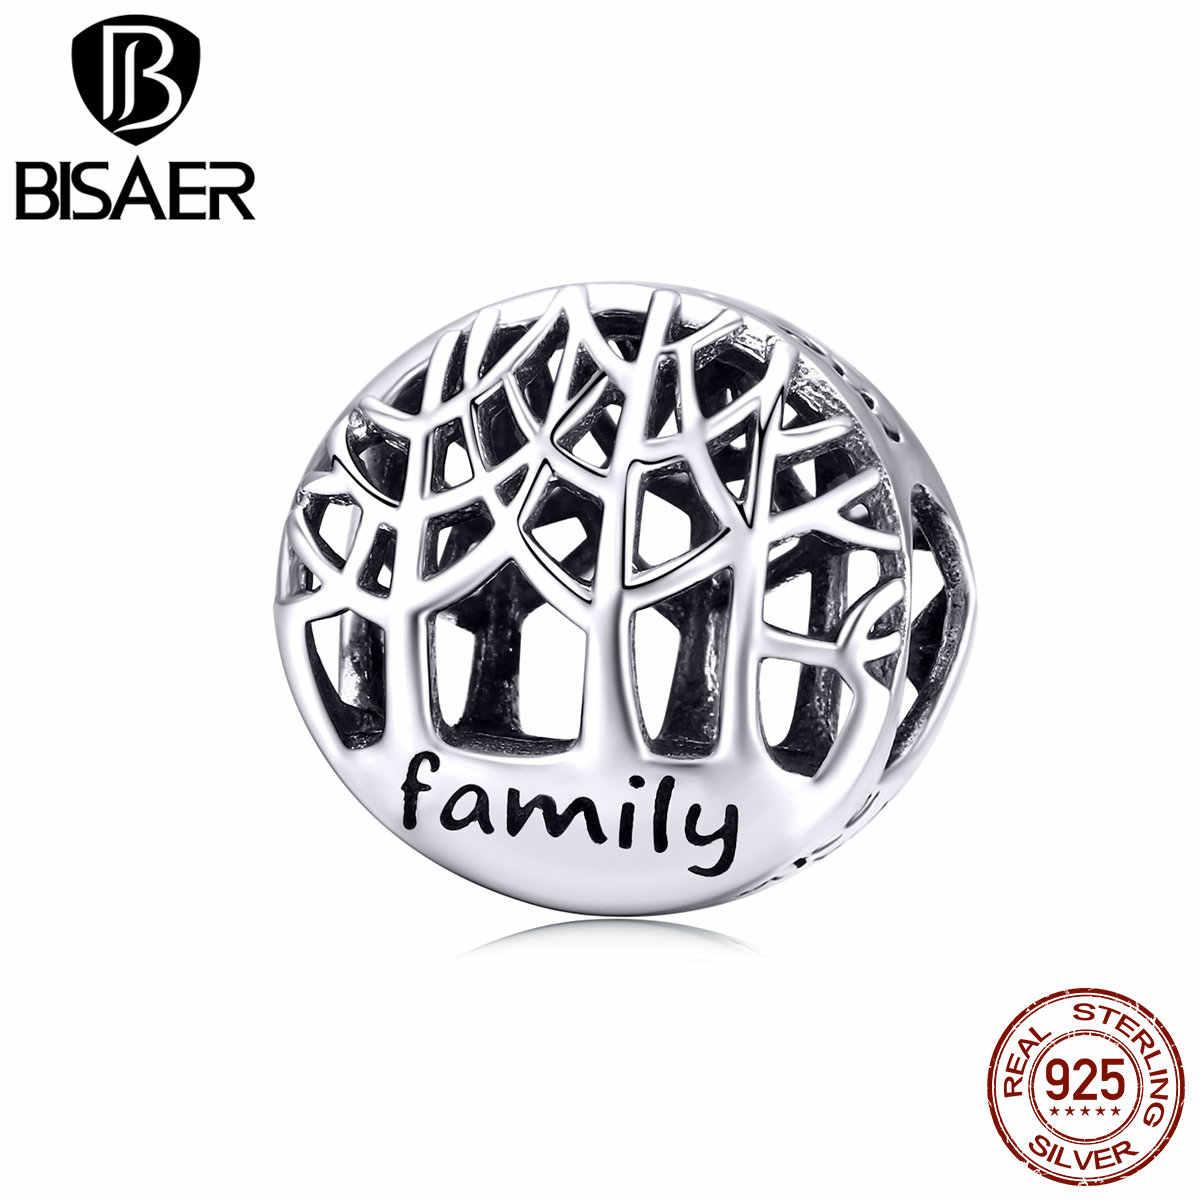 BISAER 100% 925 Sterling Silver ชีวิตต้นไม้ลูกปัดครอบครัวรัก Charm เหมาะกับกำไลสร้อยคอเครื่องประดับของขวัญวันแม่ HSC1144